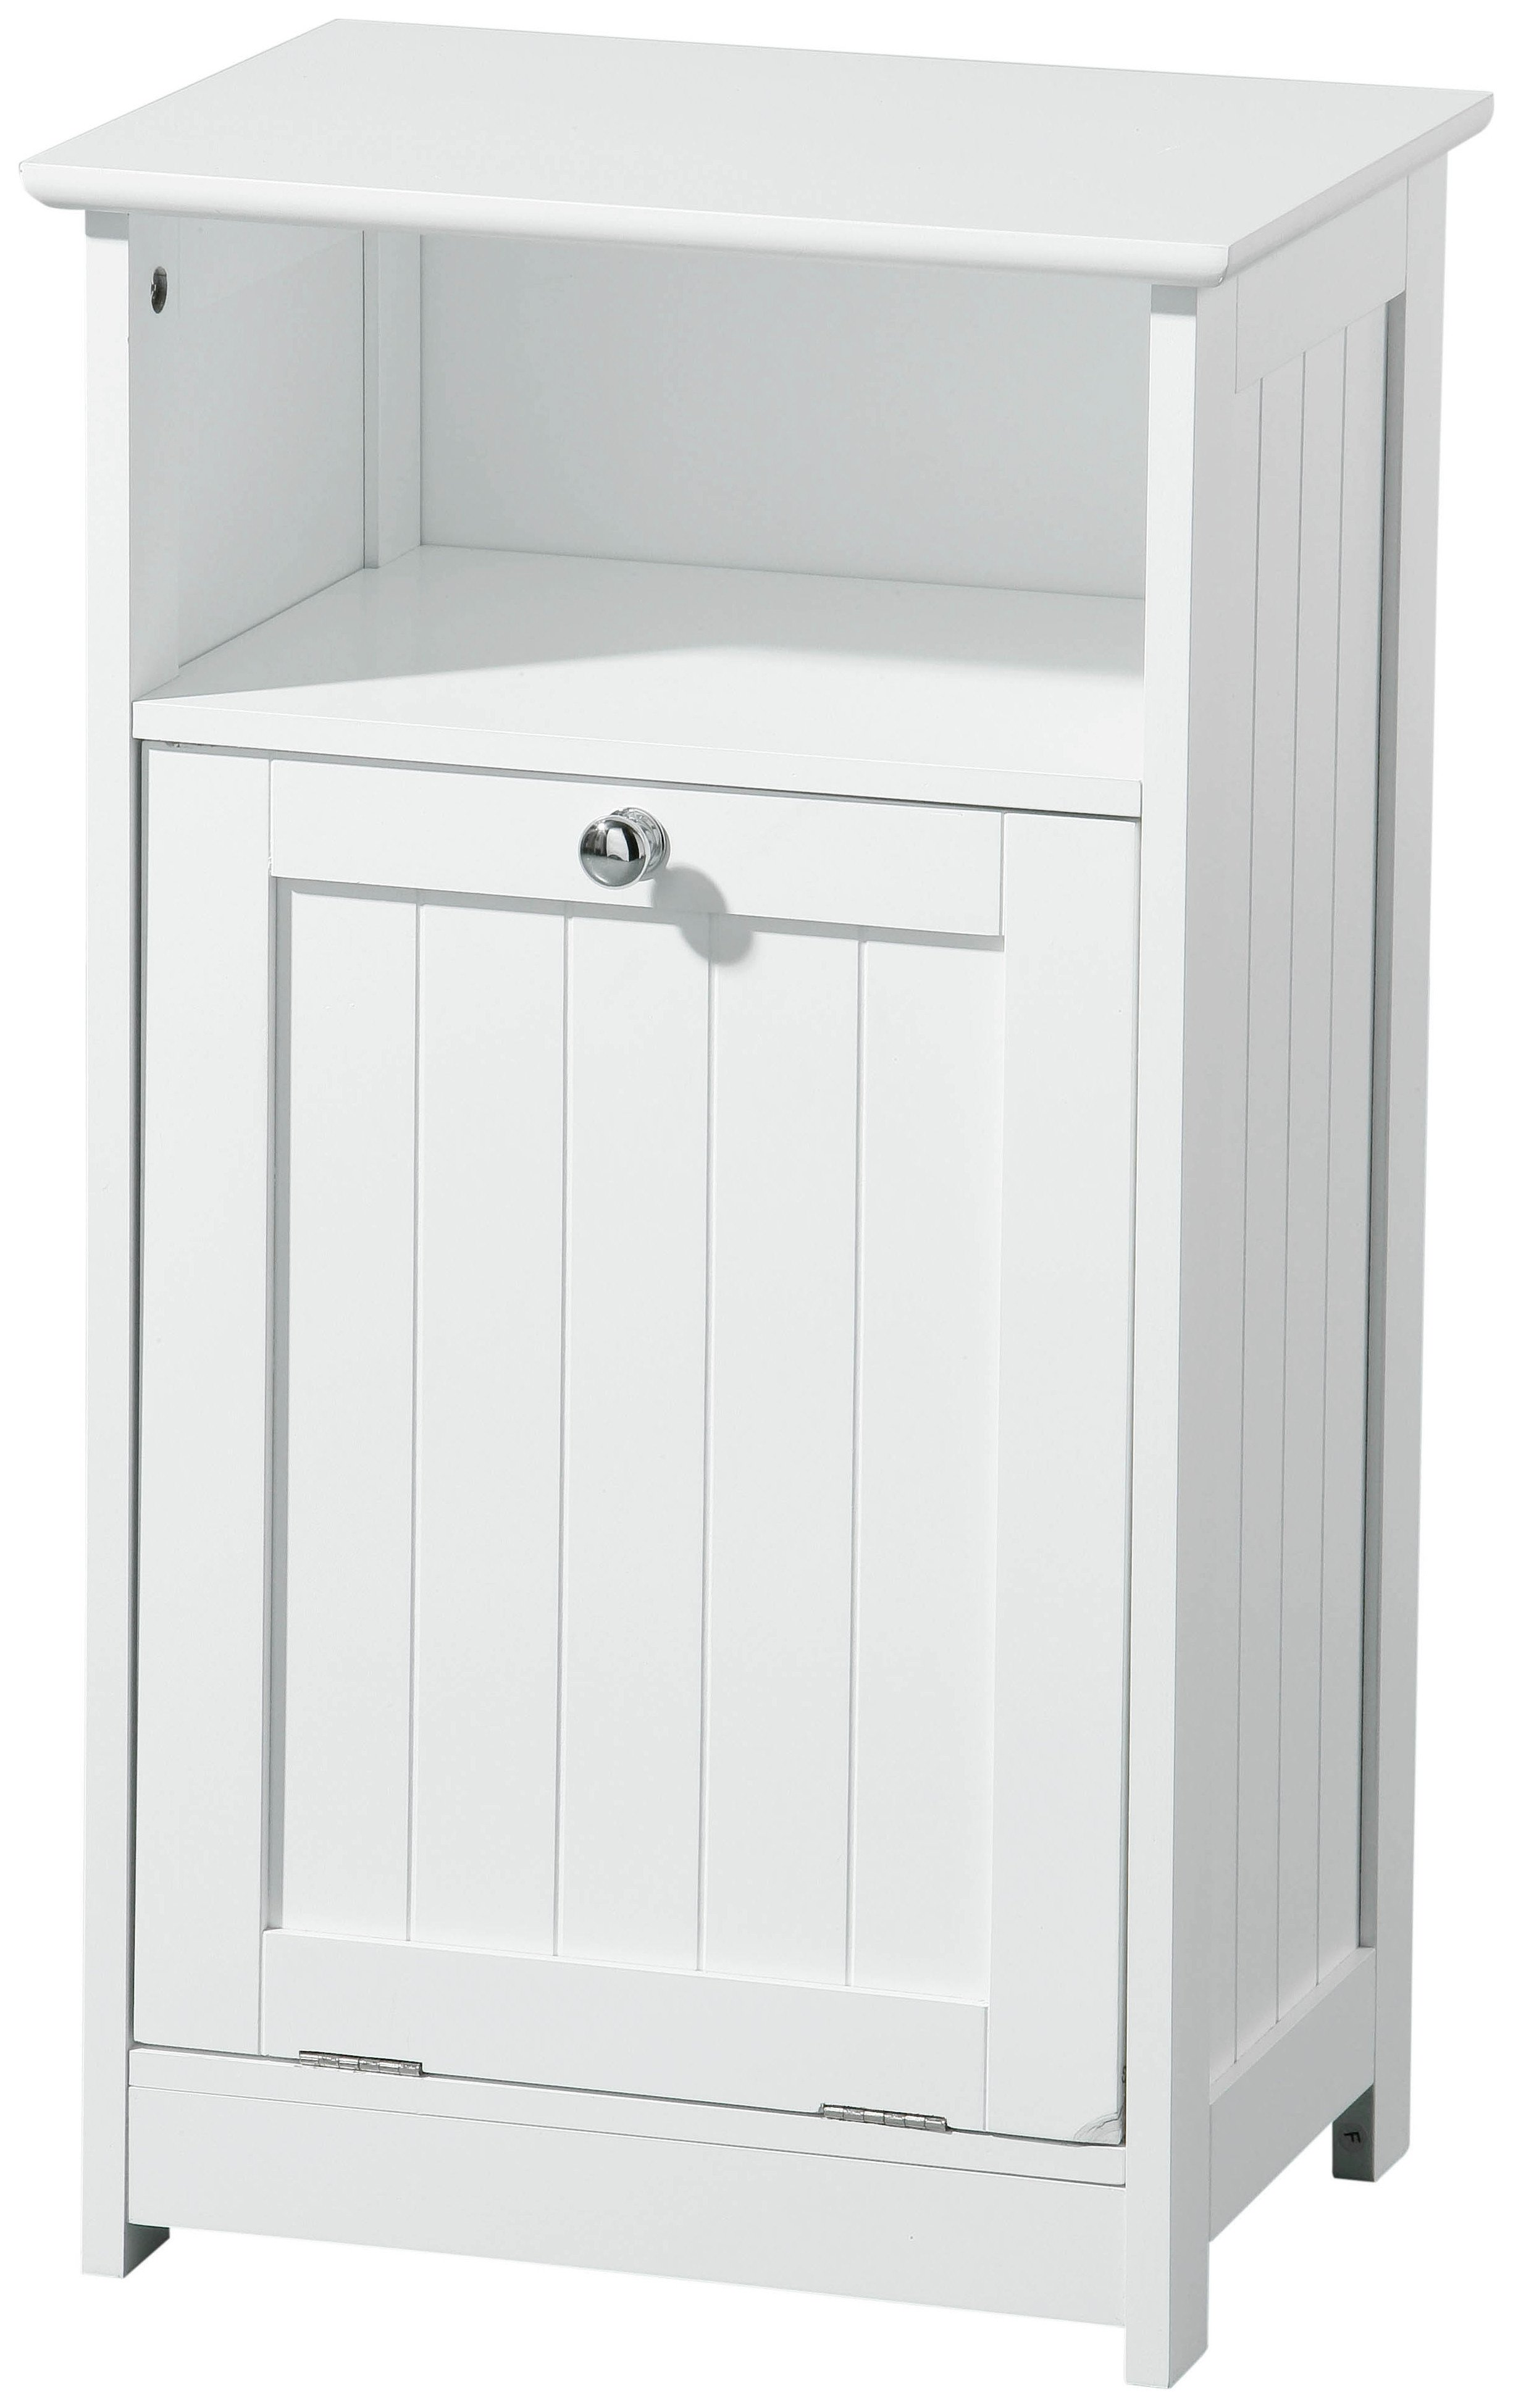 Bathroom Cabinets Page 1 Argos Price Tracker